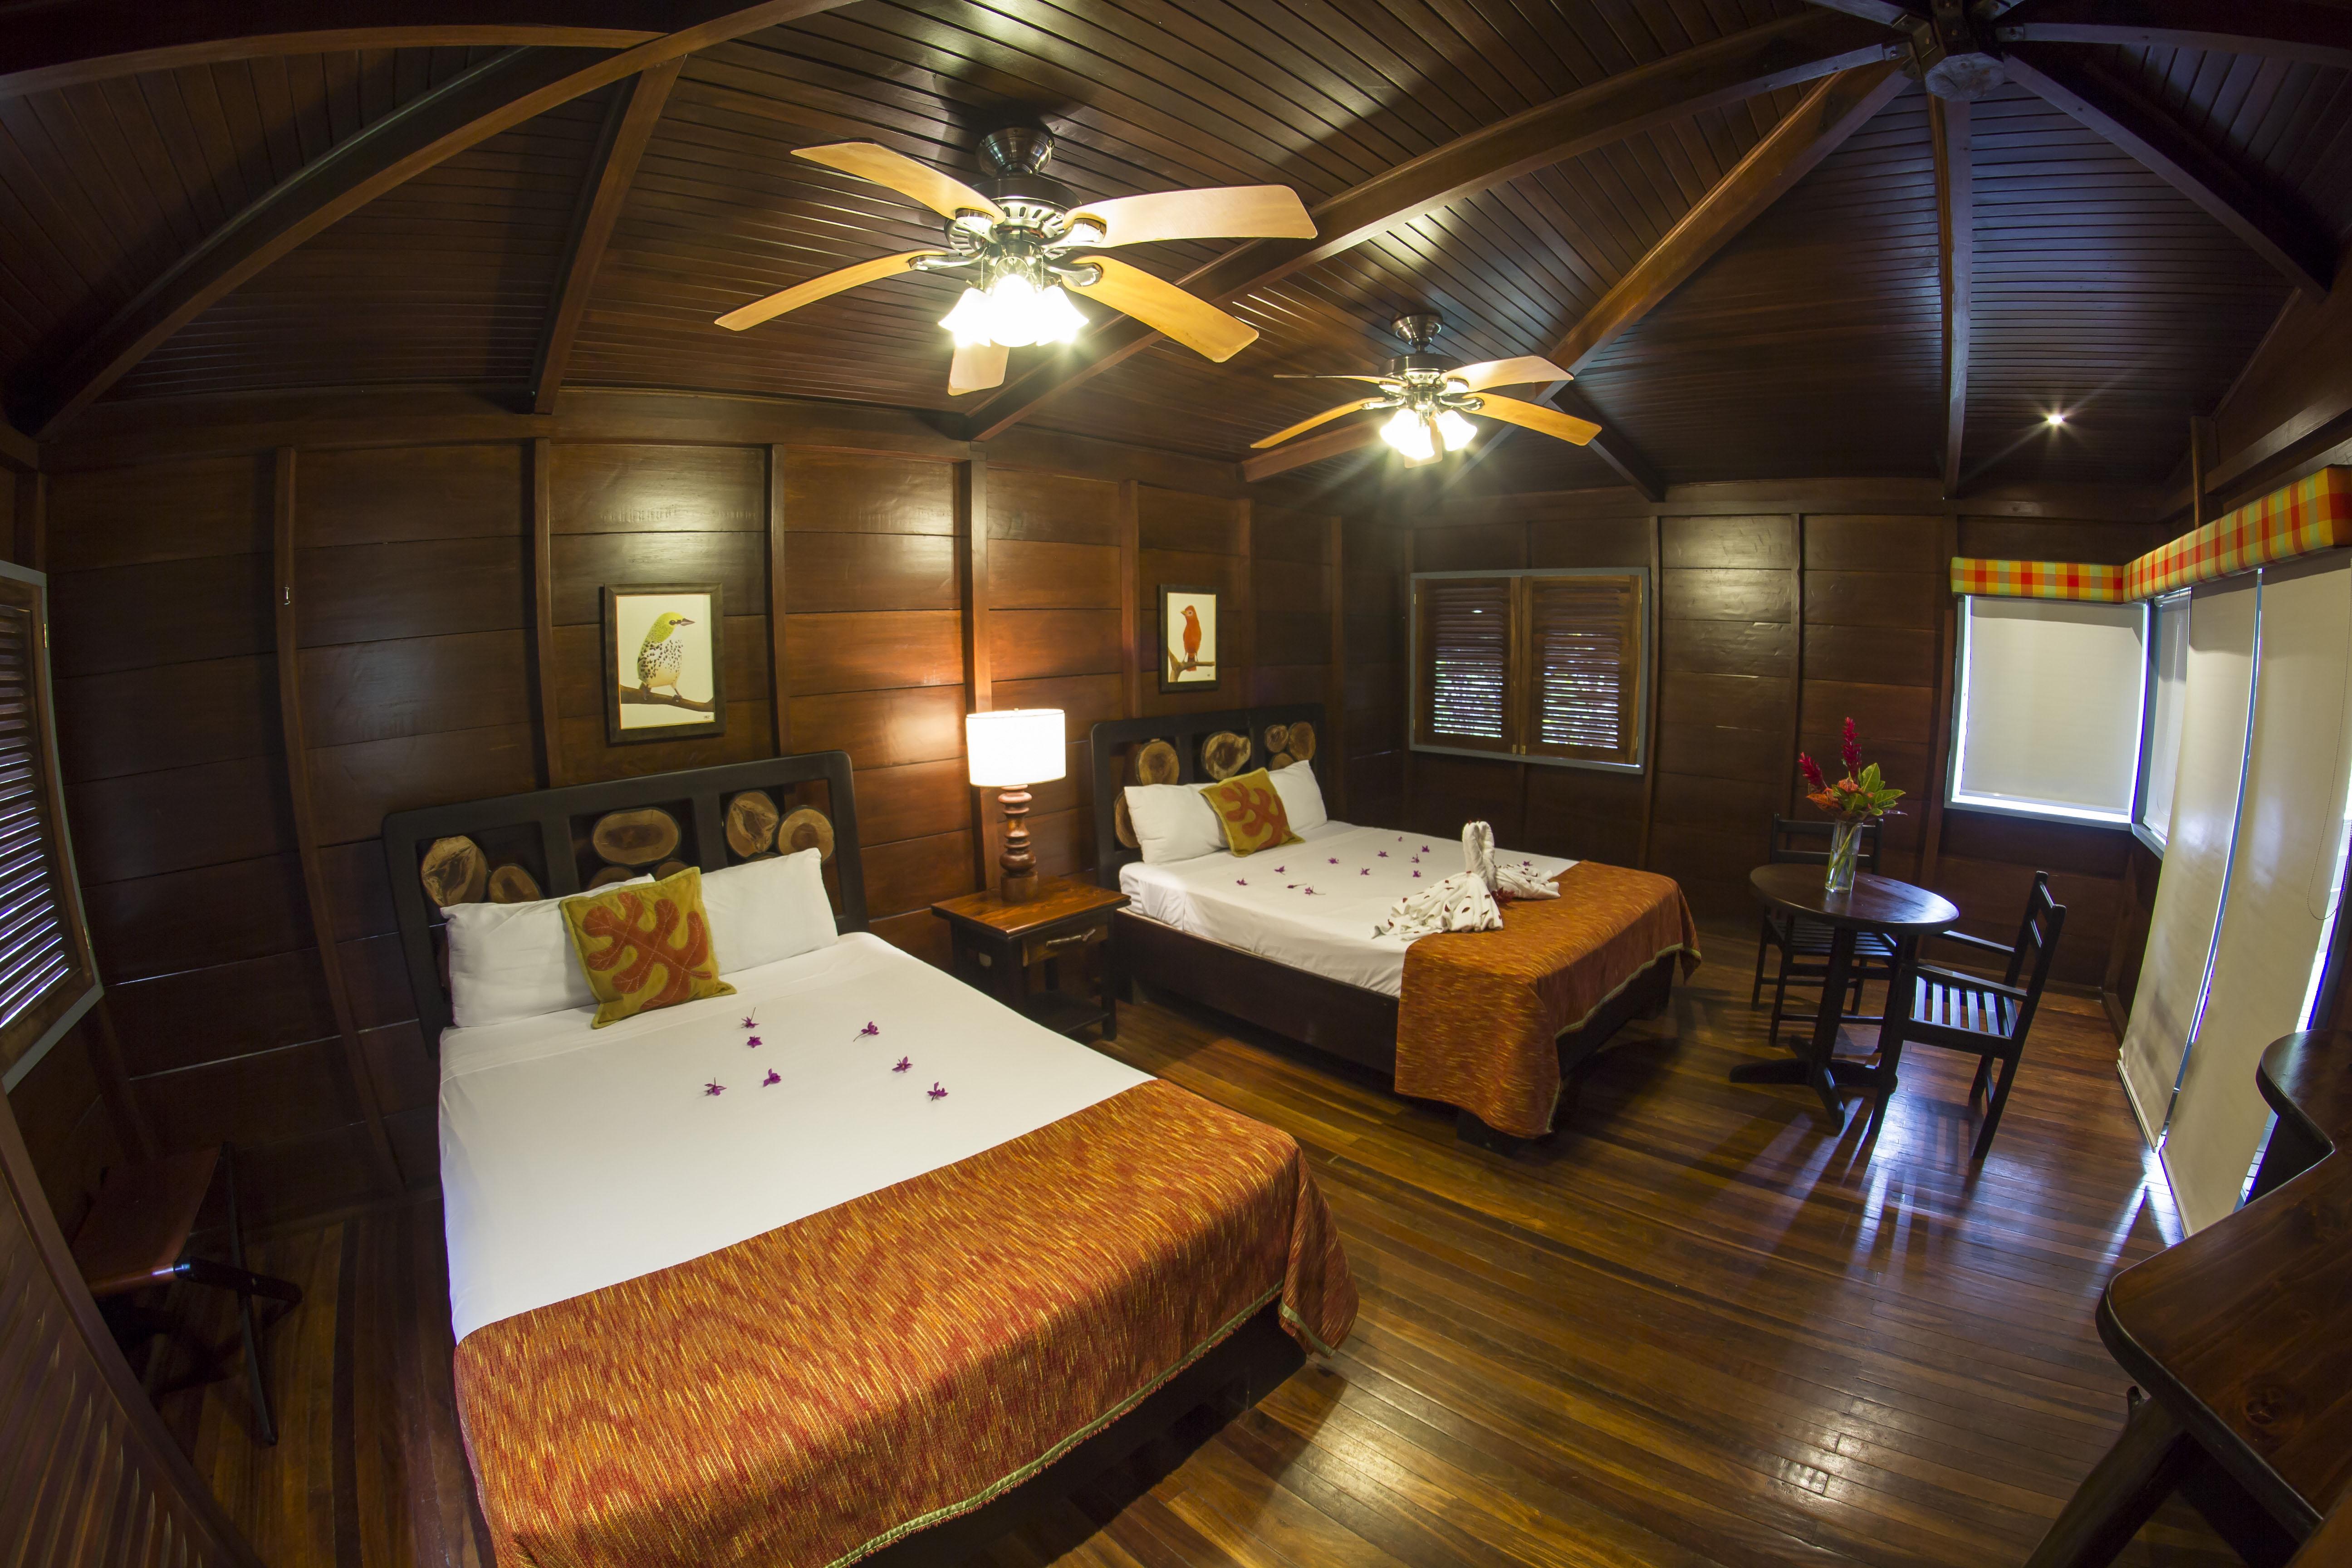 Rainforest Bedroom Rooms Chachagua Rainforest Hotel Eco Lodge